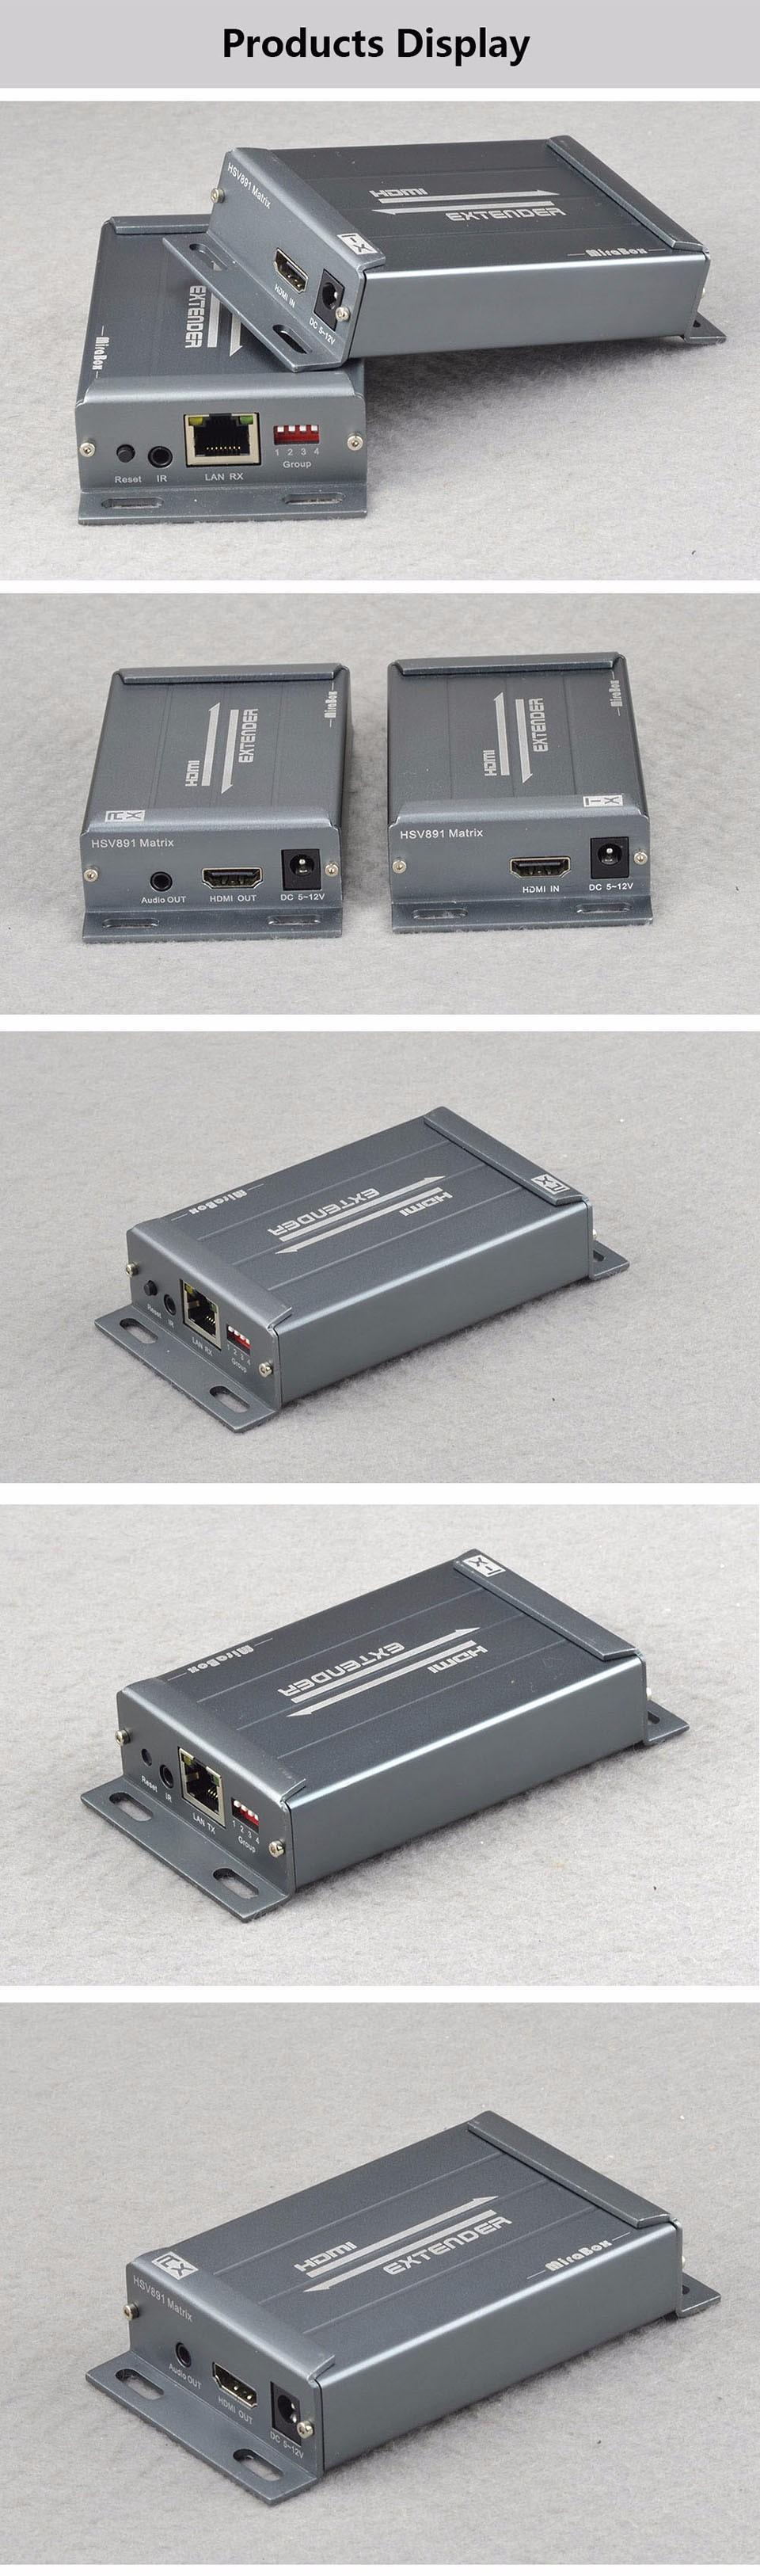 HDMI-EXTENDER-HSV891Matrix_15